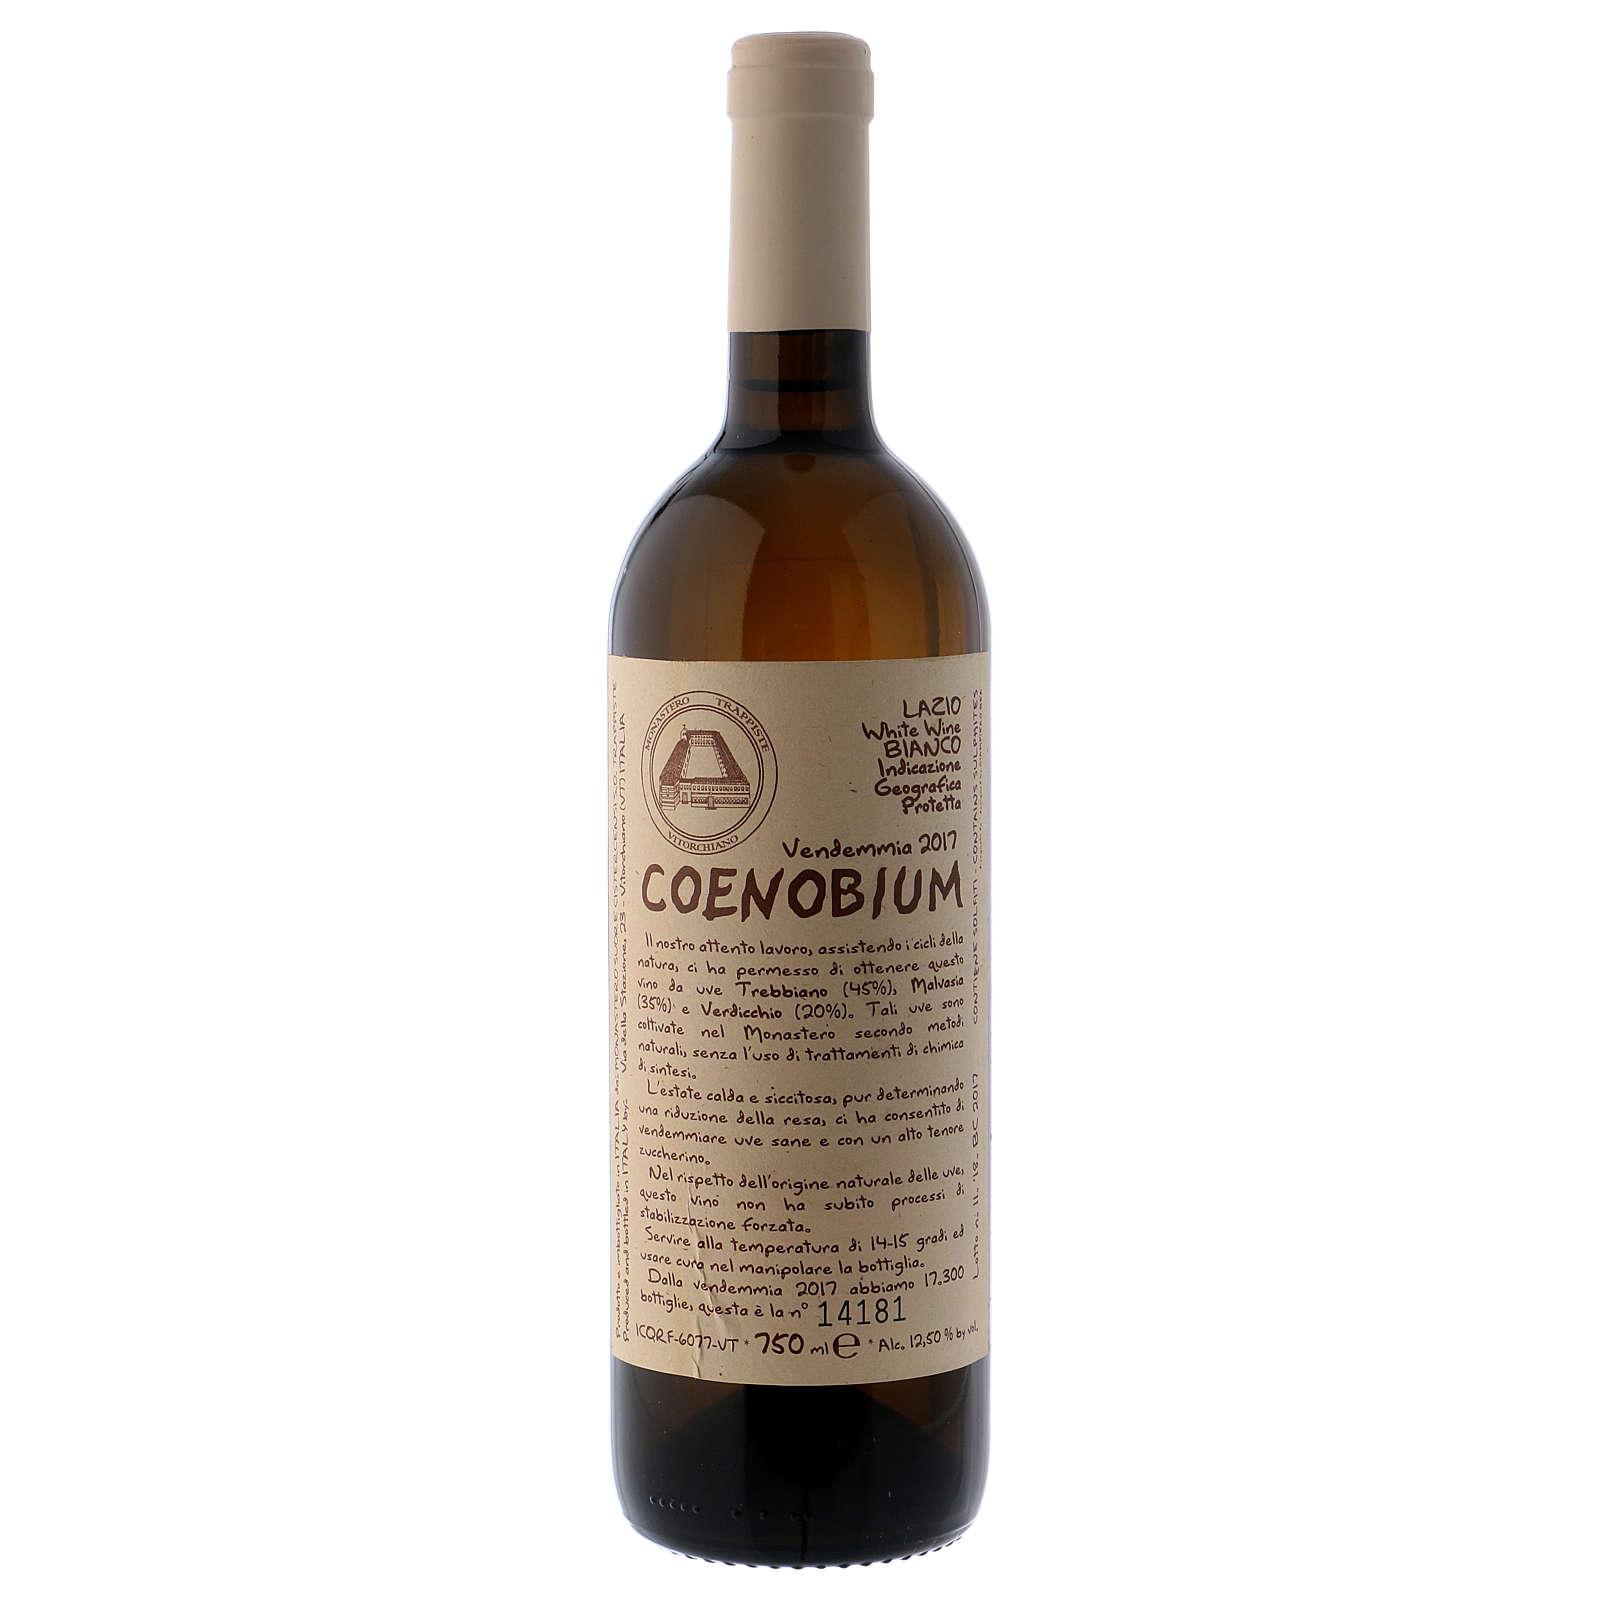 Vino Coenobium bianco Vitorchiano 750 ml vendemmia 2016 3